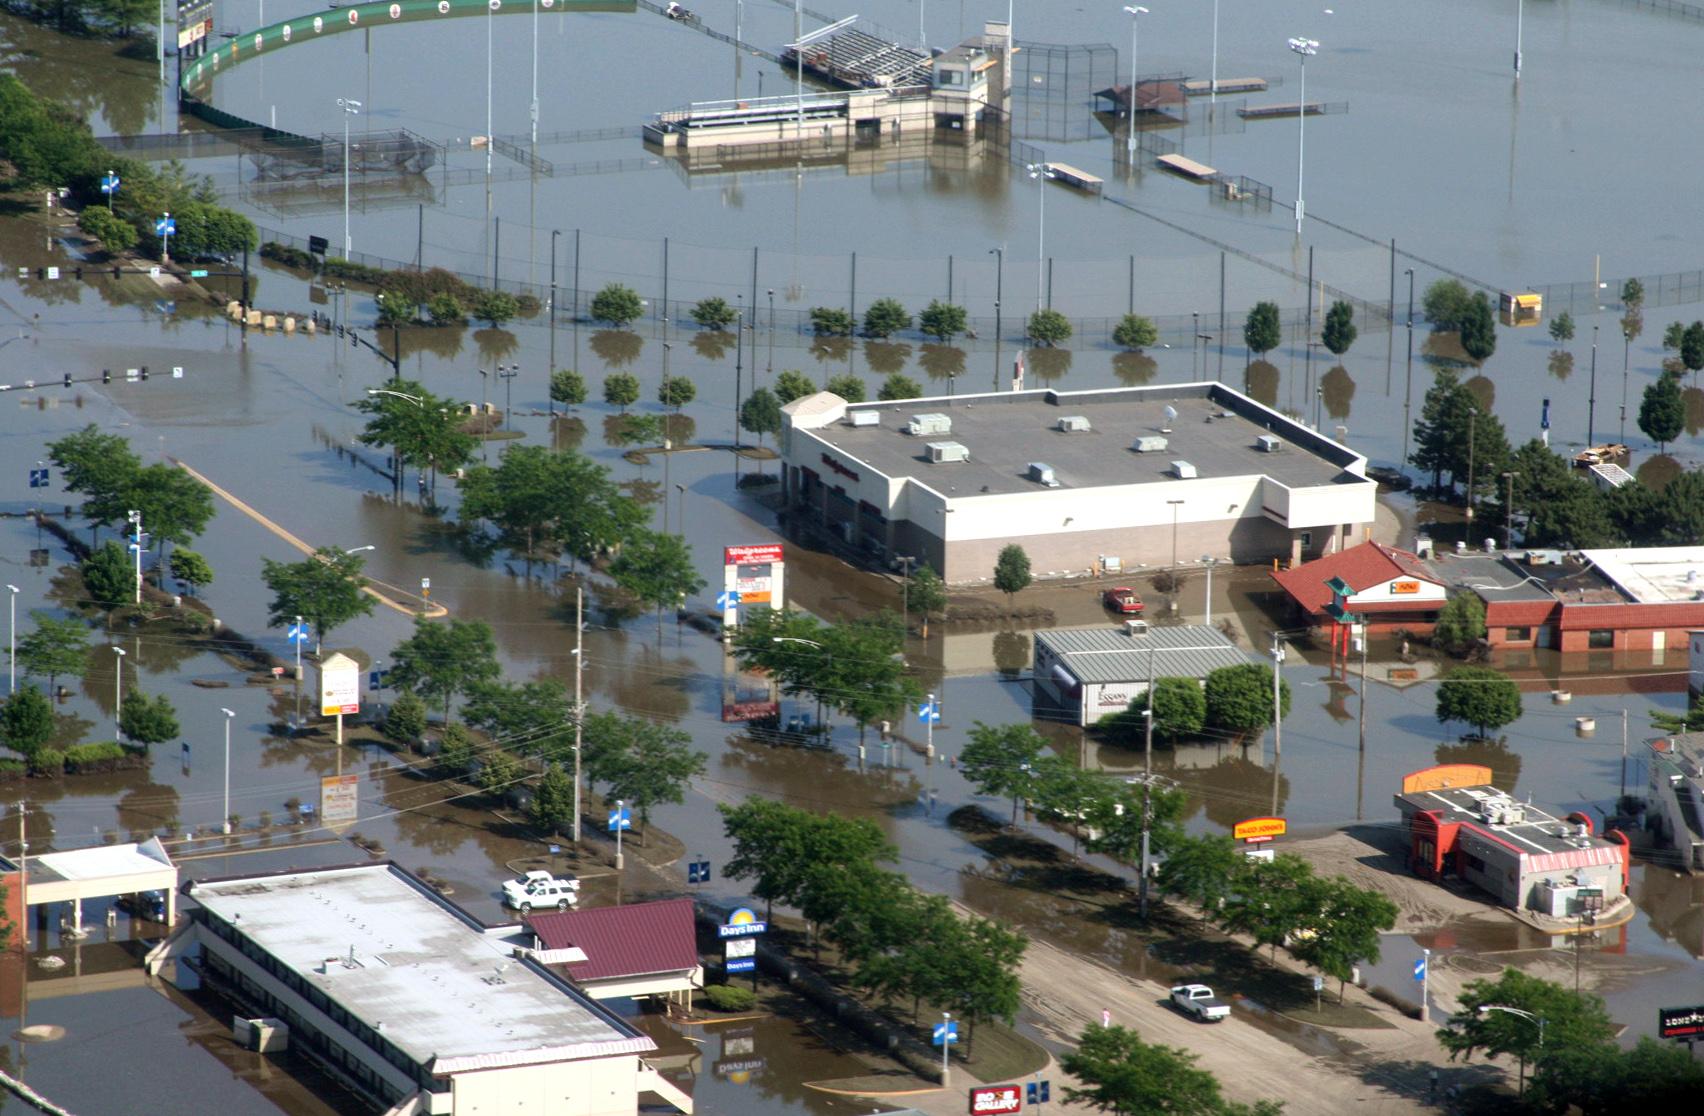 Flood Damage Commercial Insurance Claims Adjusters International Basloe Levin & Cuccaro